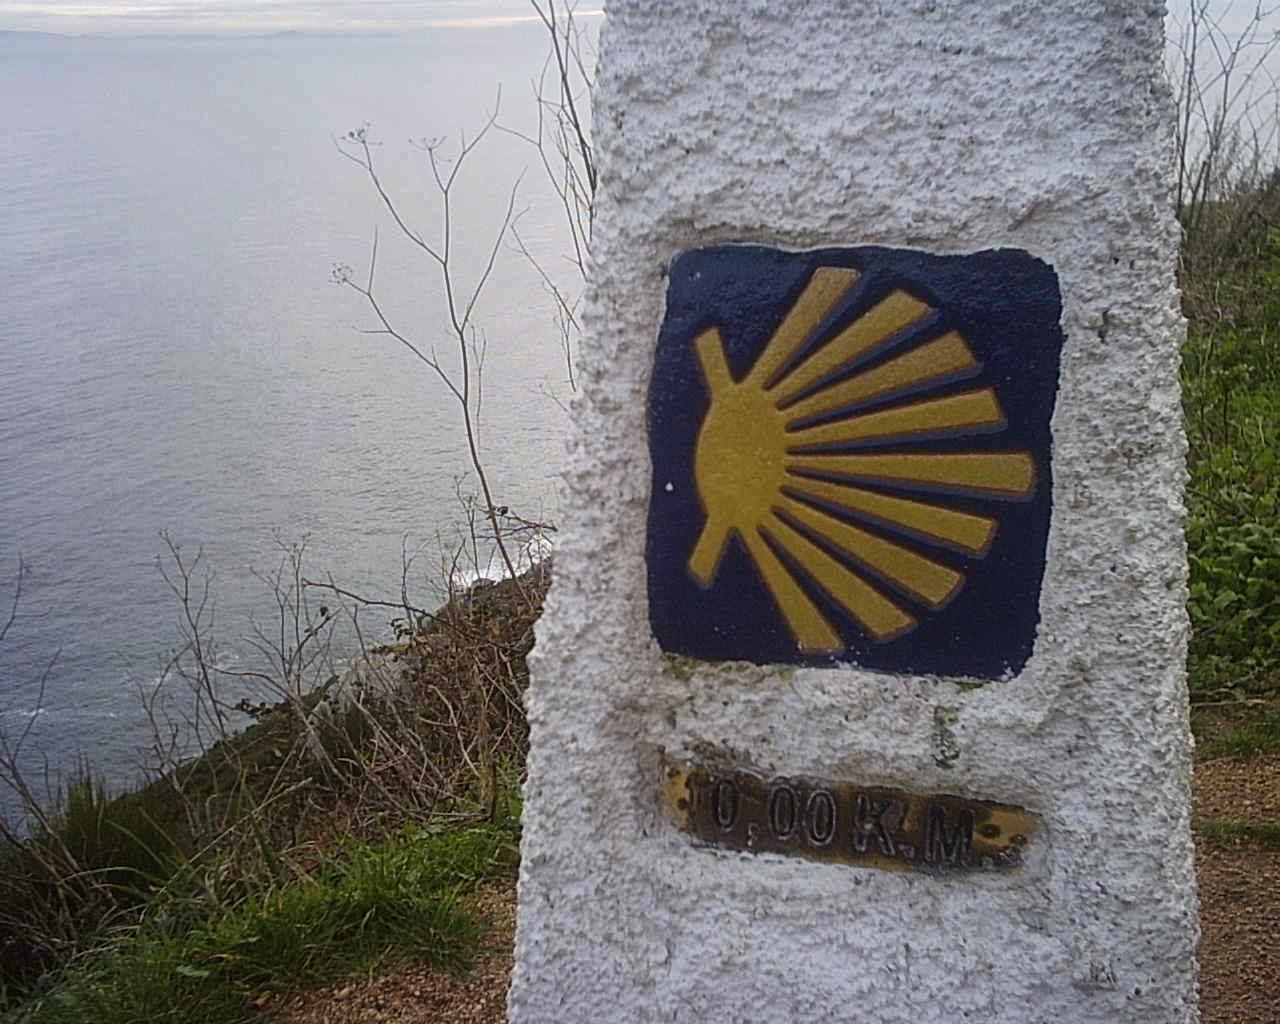 Santiago 0